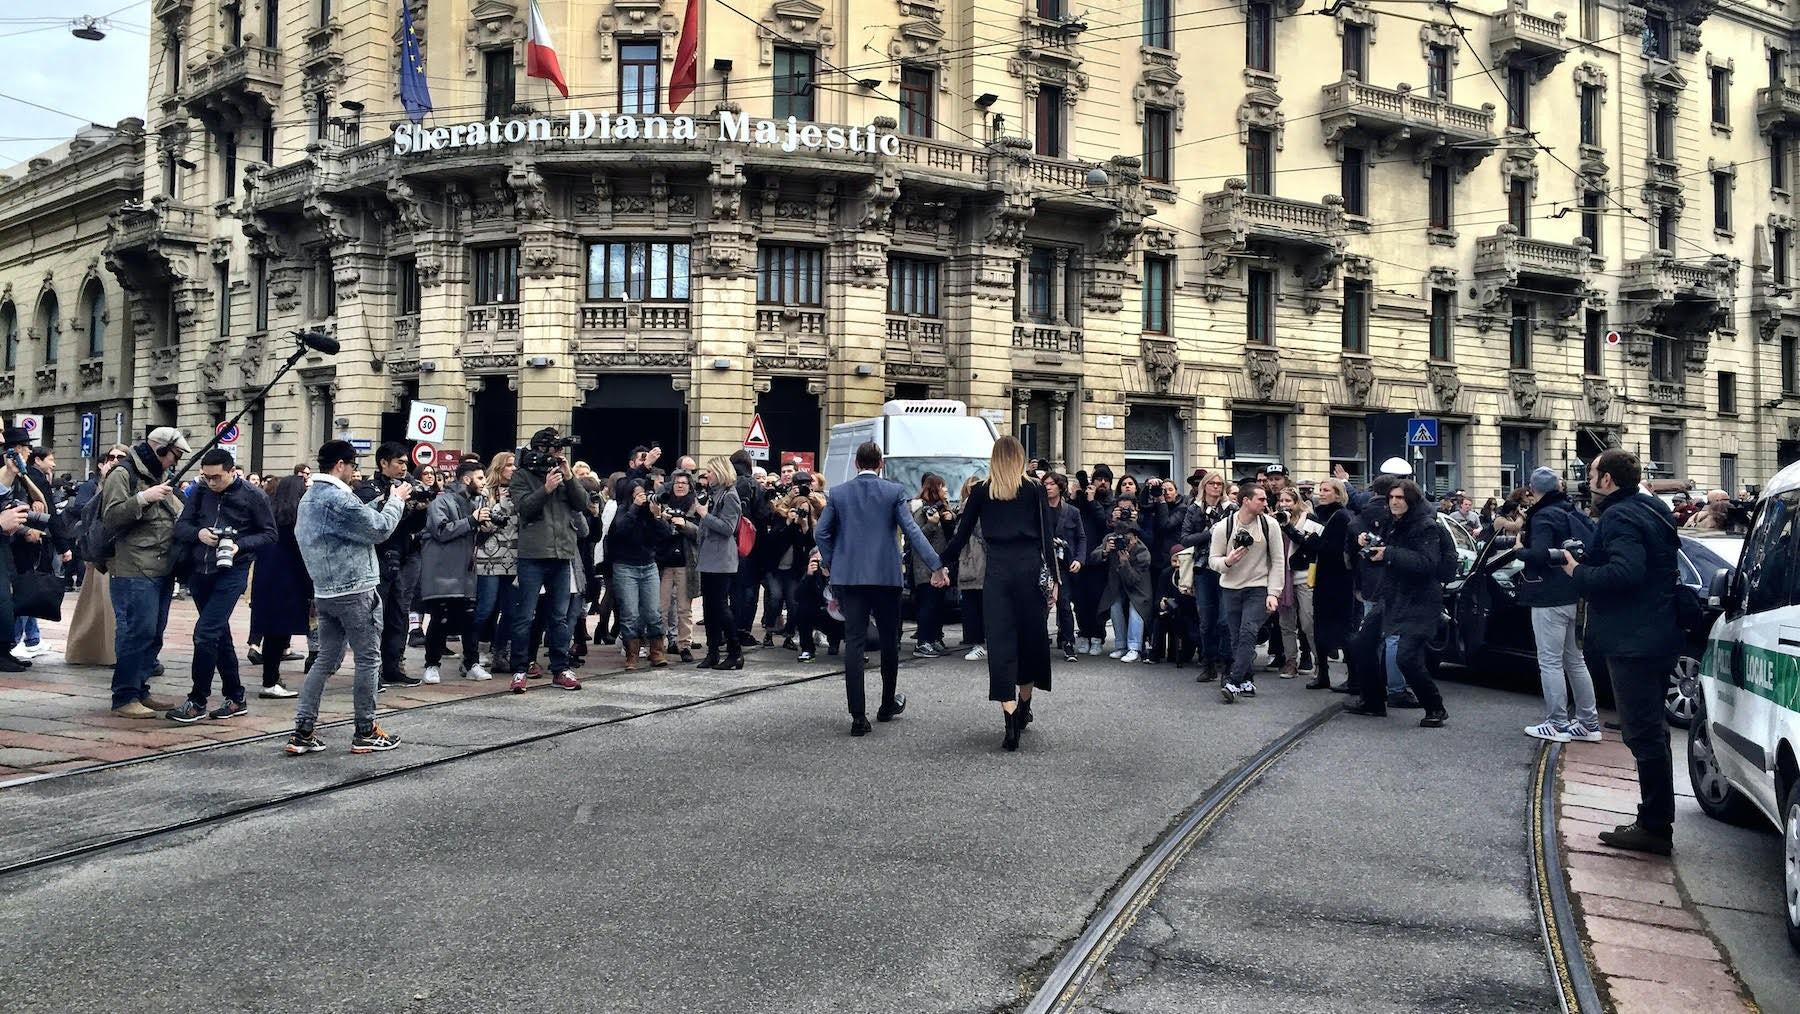 Justin O'Shea and Veronika Heilbrunner in Milan | Photo: Imran Amed